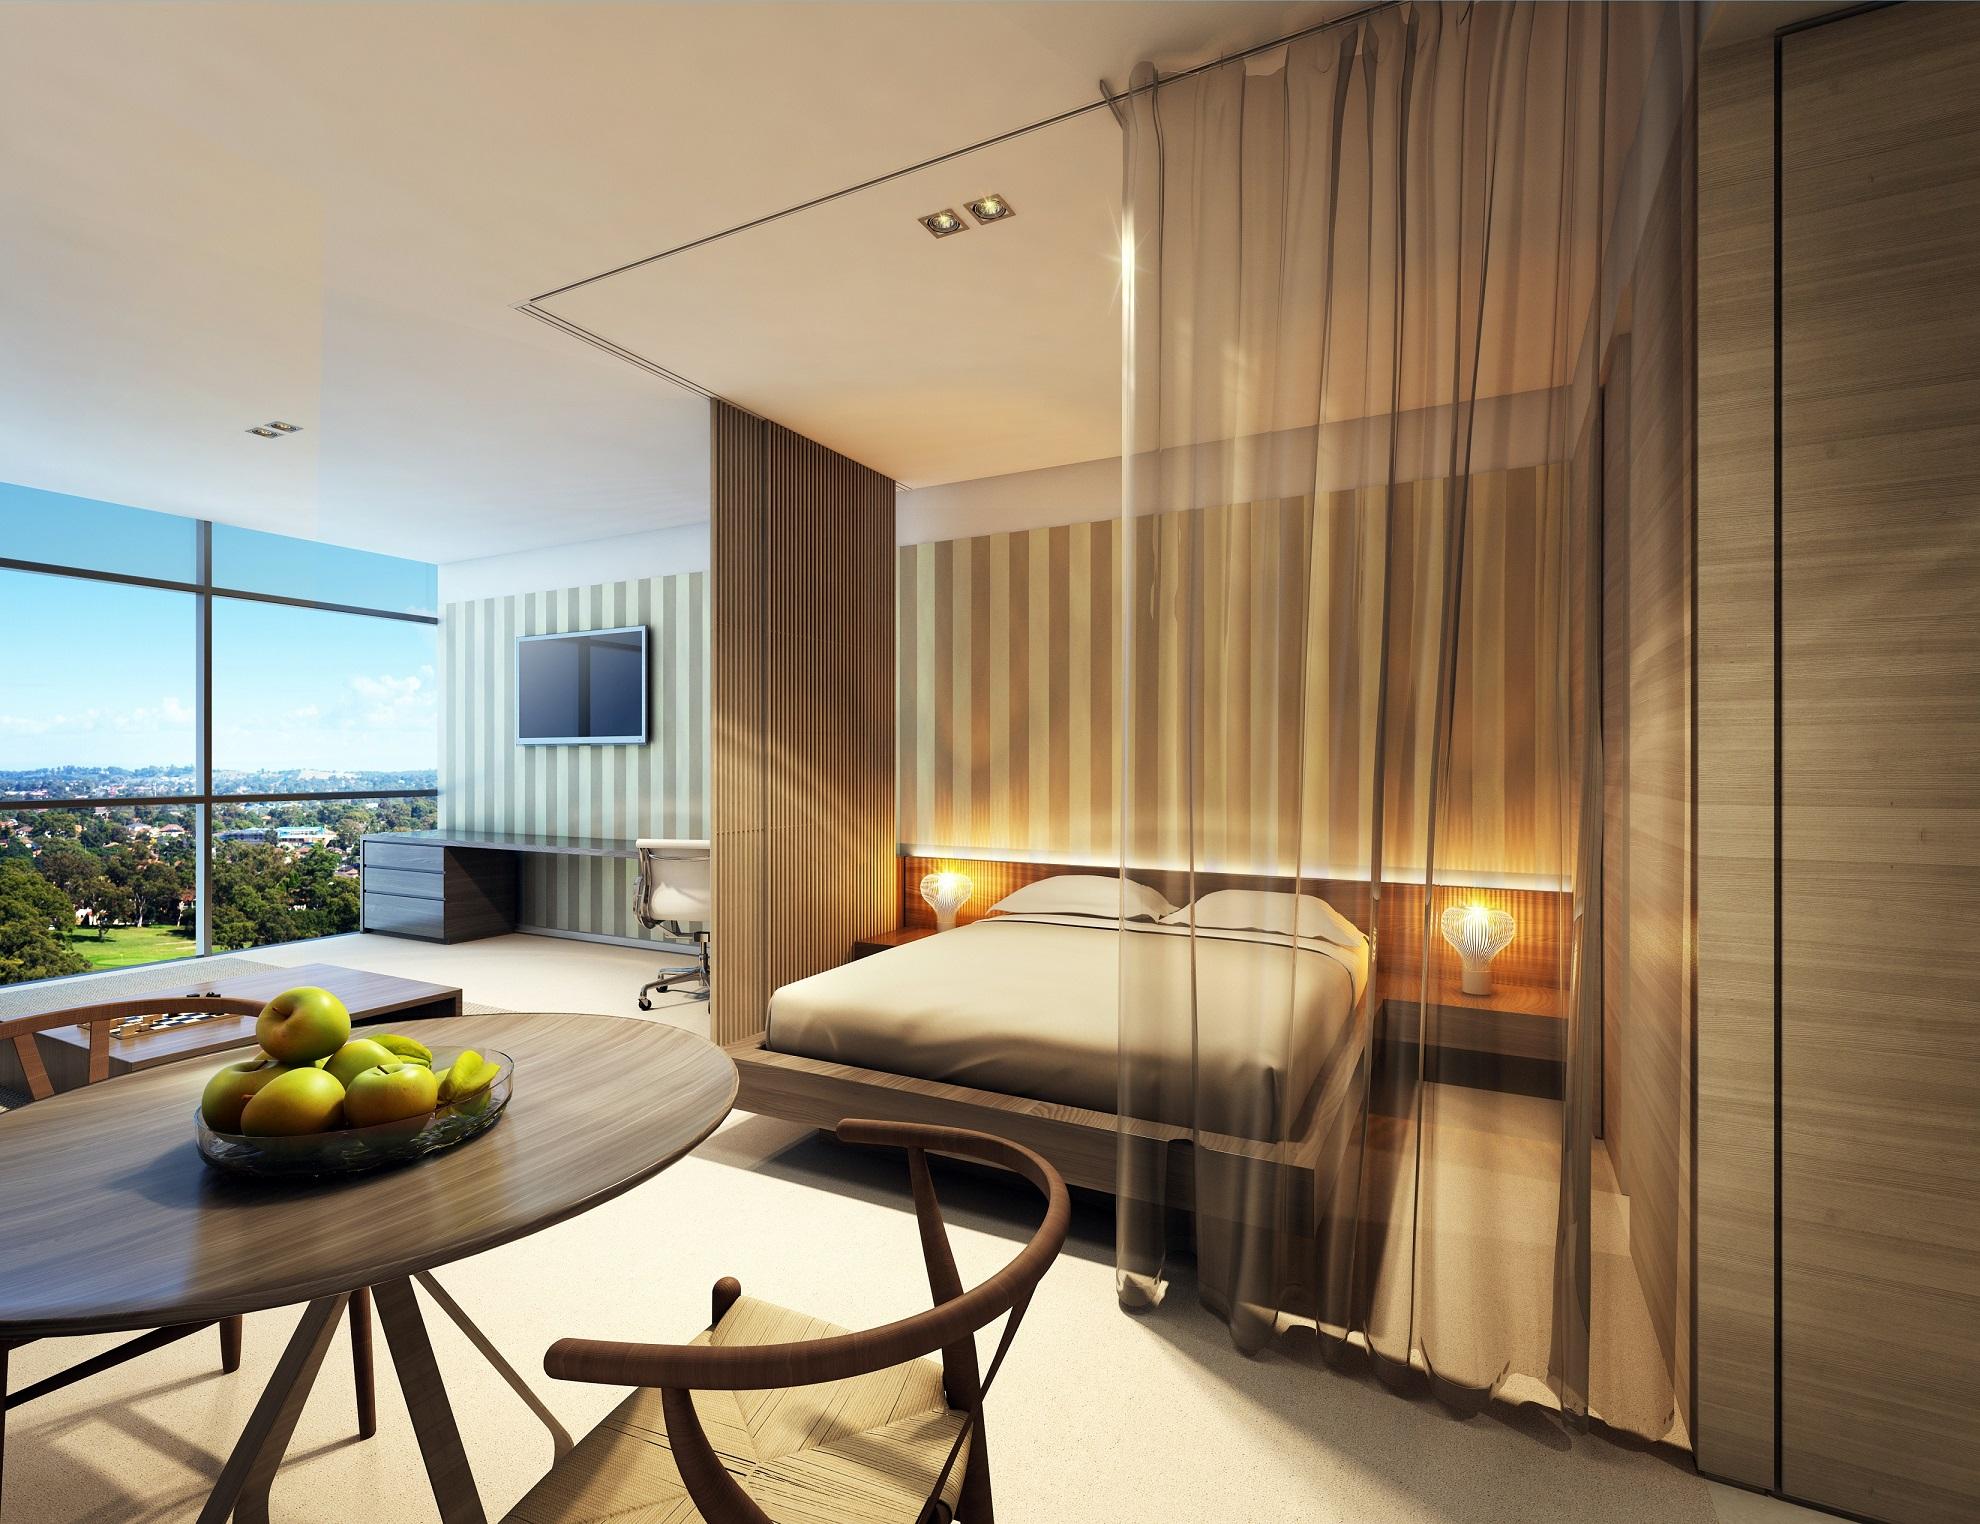 Macquarie Street Parramatta Nsw 2150 Off The Plan Apartment For Sale Domain